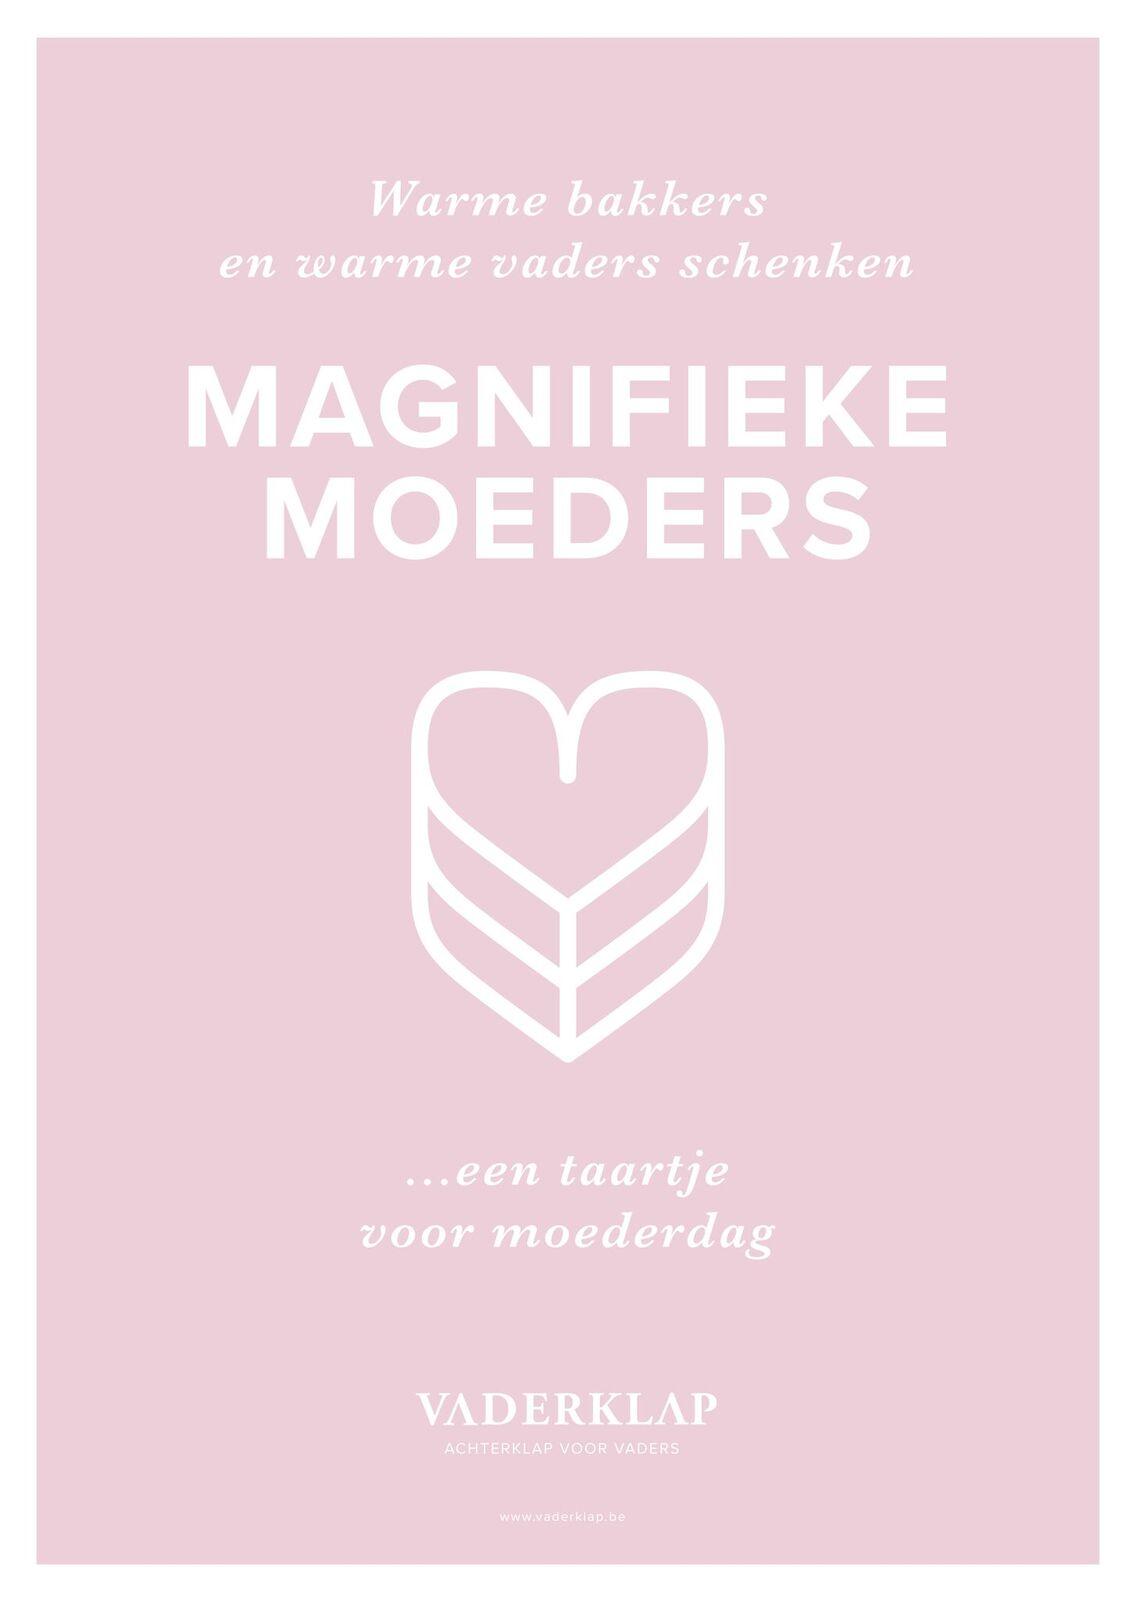 Moederdag_Poster-01_preview.jpeg